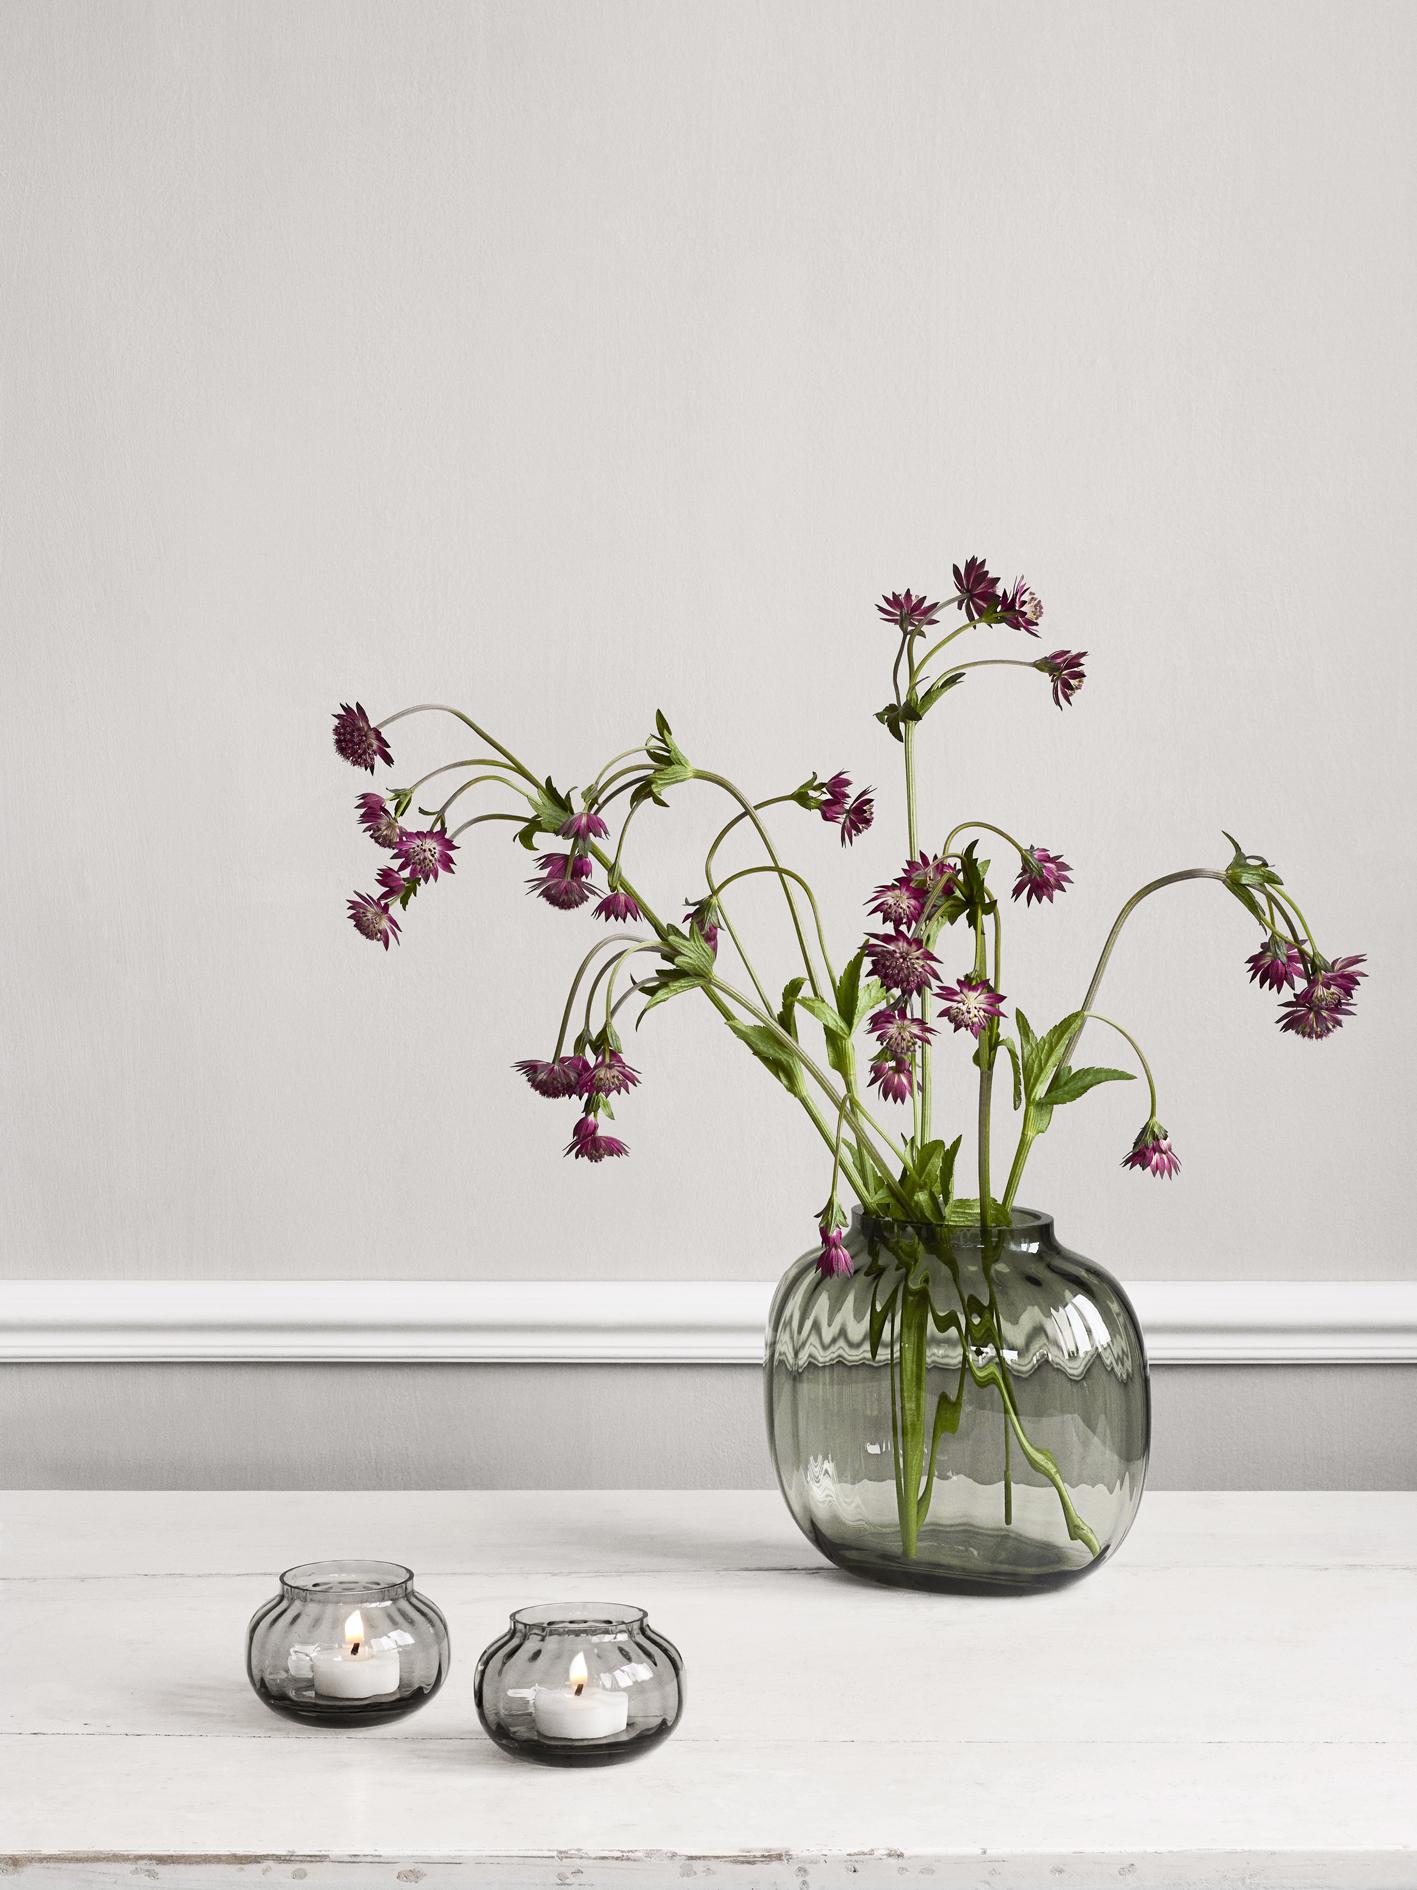 Holmegaard Primula fyrfadsstage, Ø9,5 cm, clear